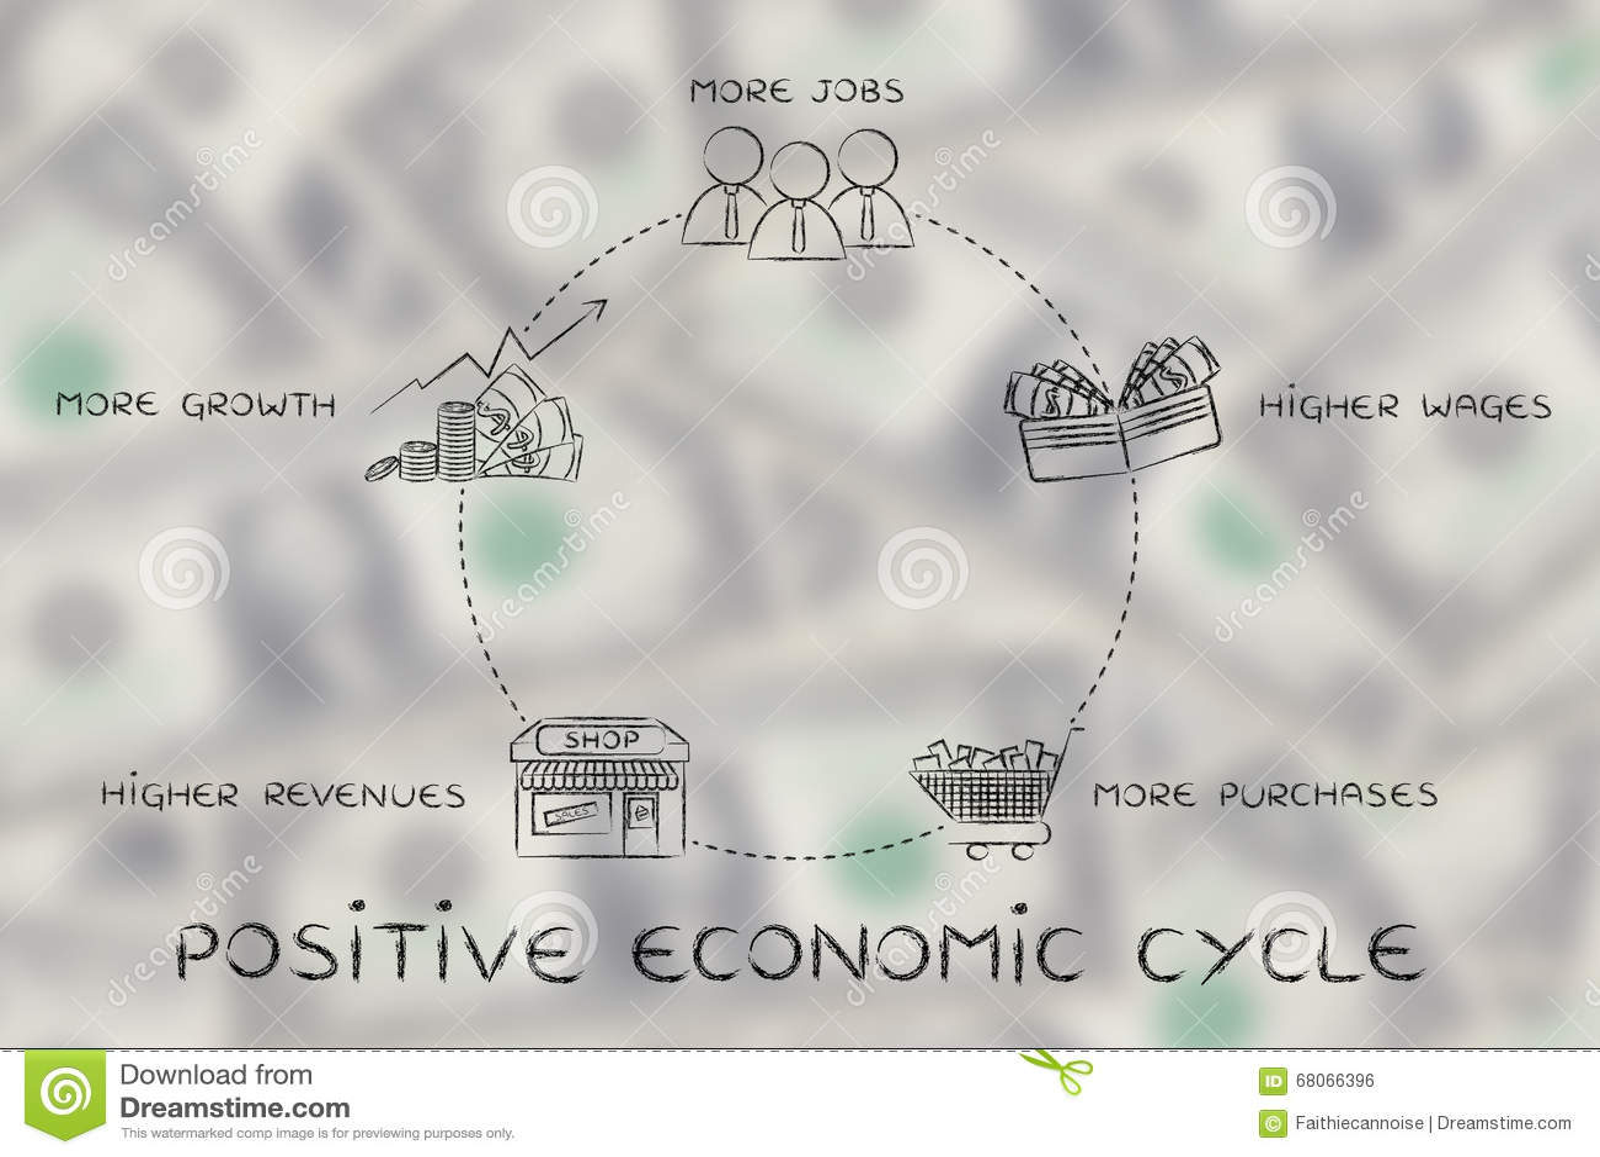 Mer jobb, högre timpenningar, mer shopping, positiv ekonomisk cirkulering